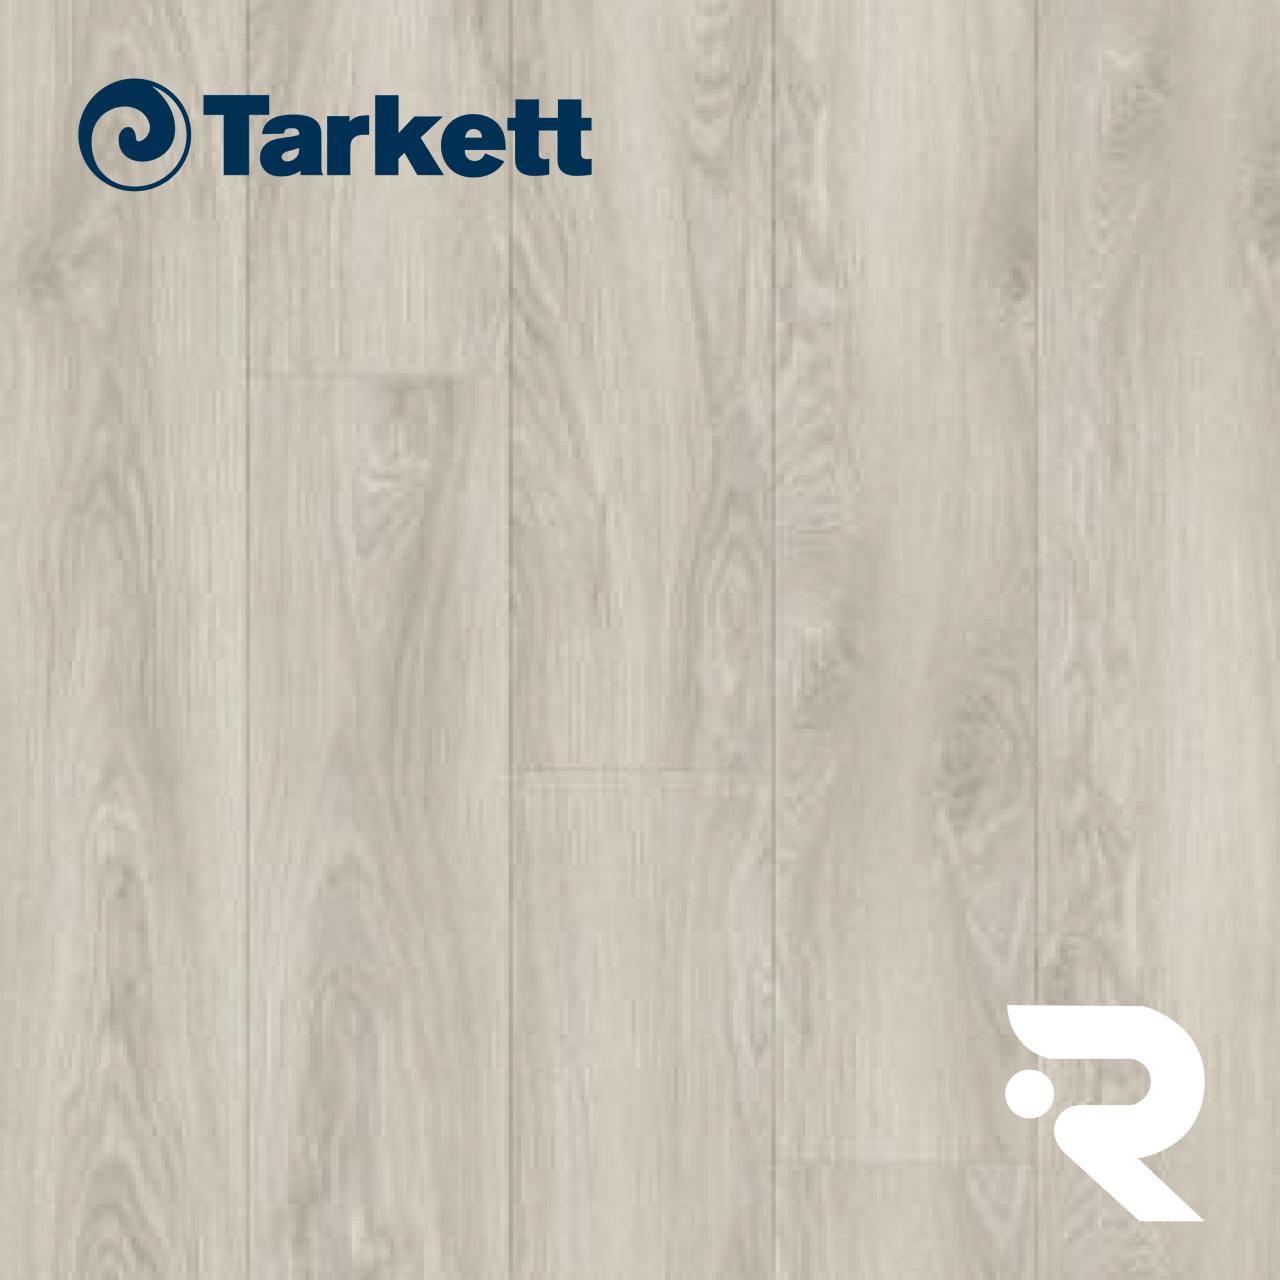 🌳 ПВХ плитка Tarkett   ModularT 7 - OAK ORIGIN COOL BEIGE   Art Vinyl   1200 x 200 мм